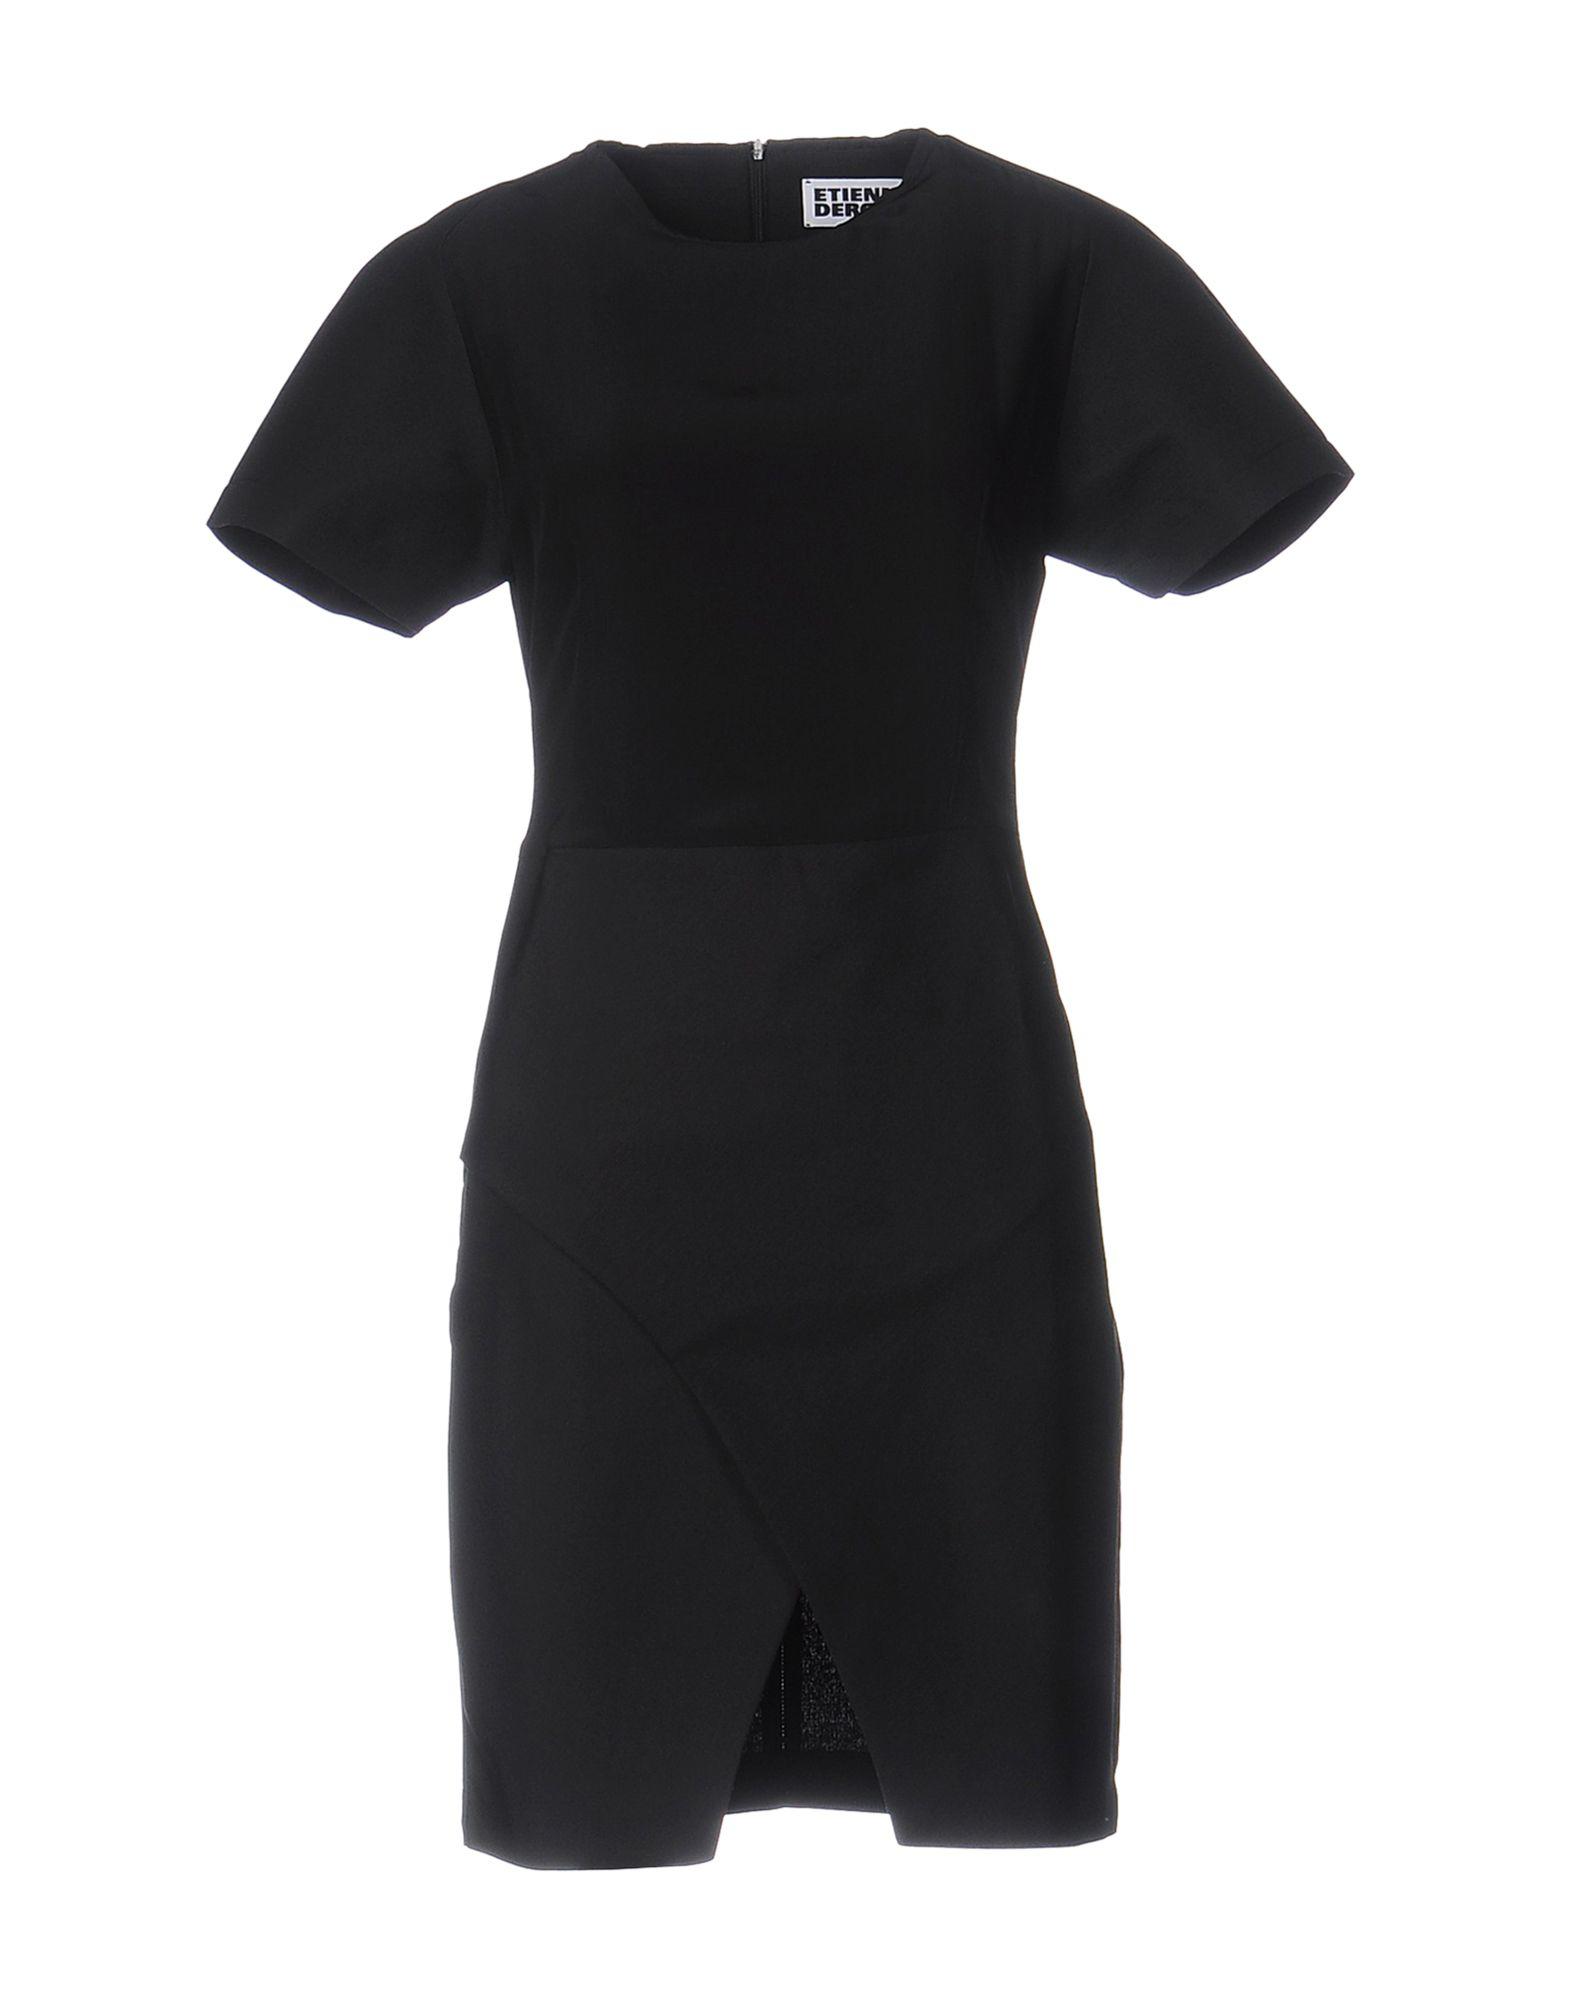 ETIENNE DEROEUX Короткое платье asse saint etienne as monaco